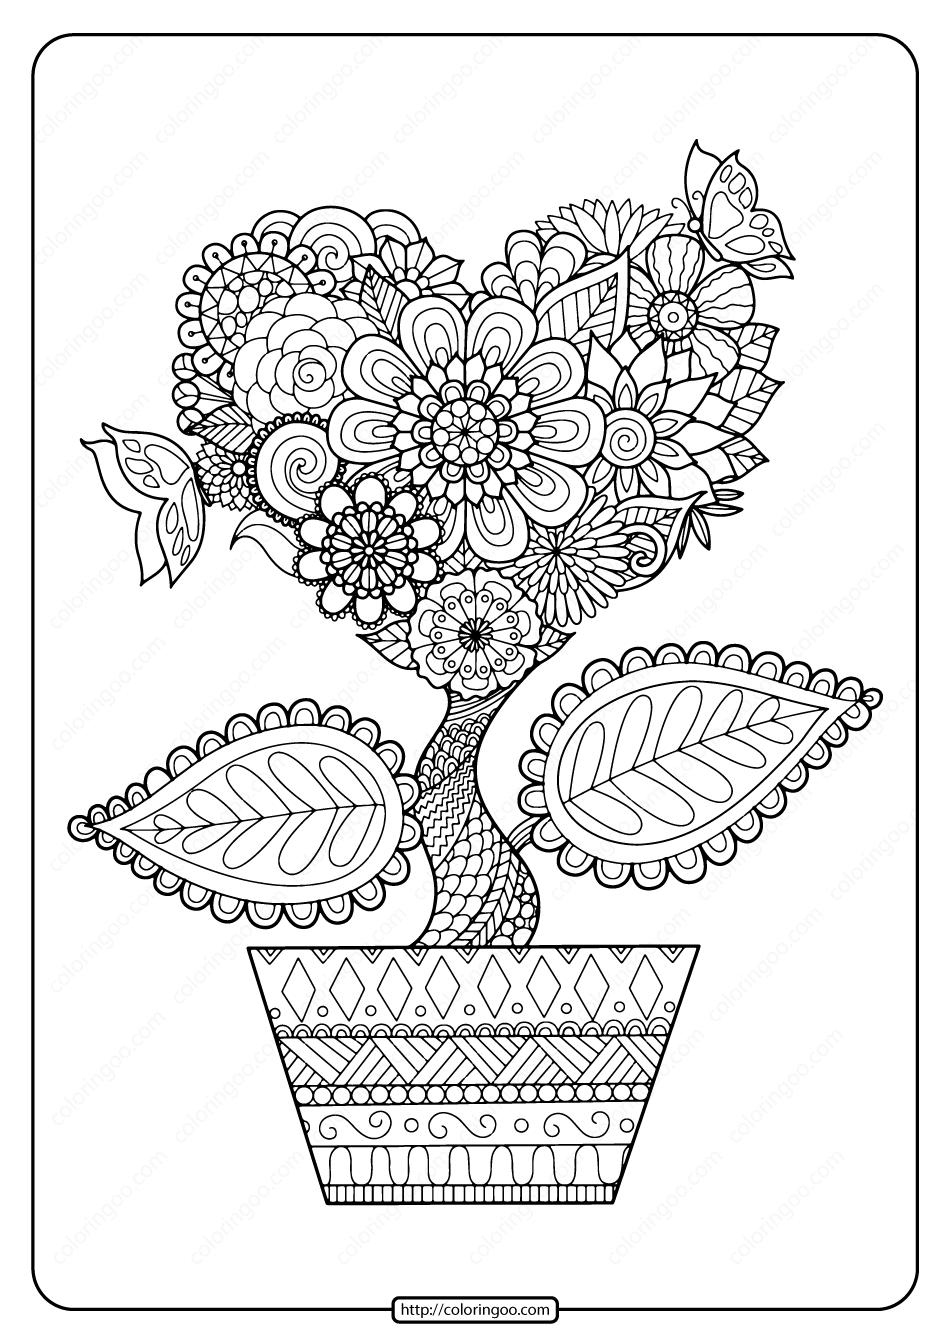 Printable Heart Flower Pdf Coloring Page in 2020 Mandala